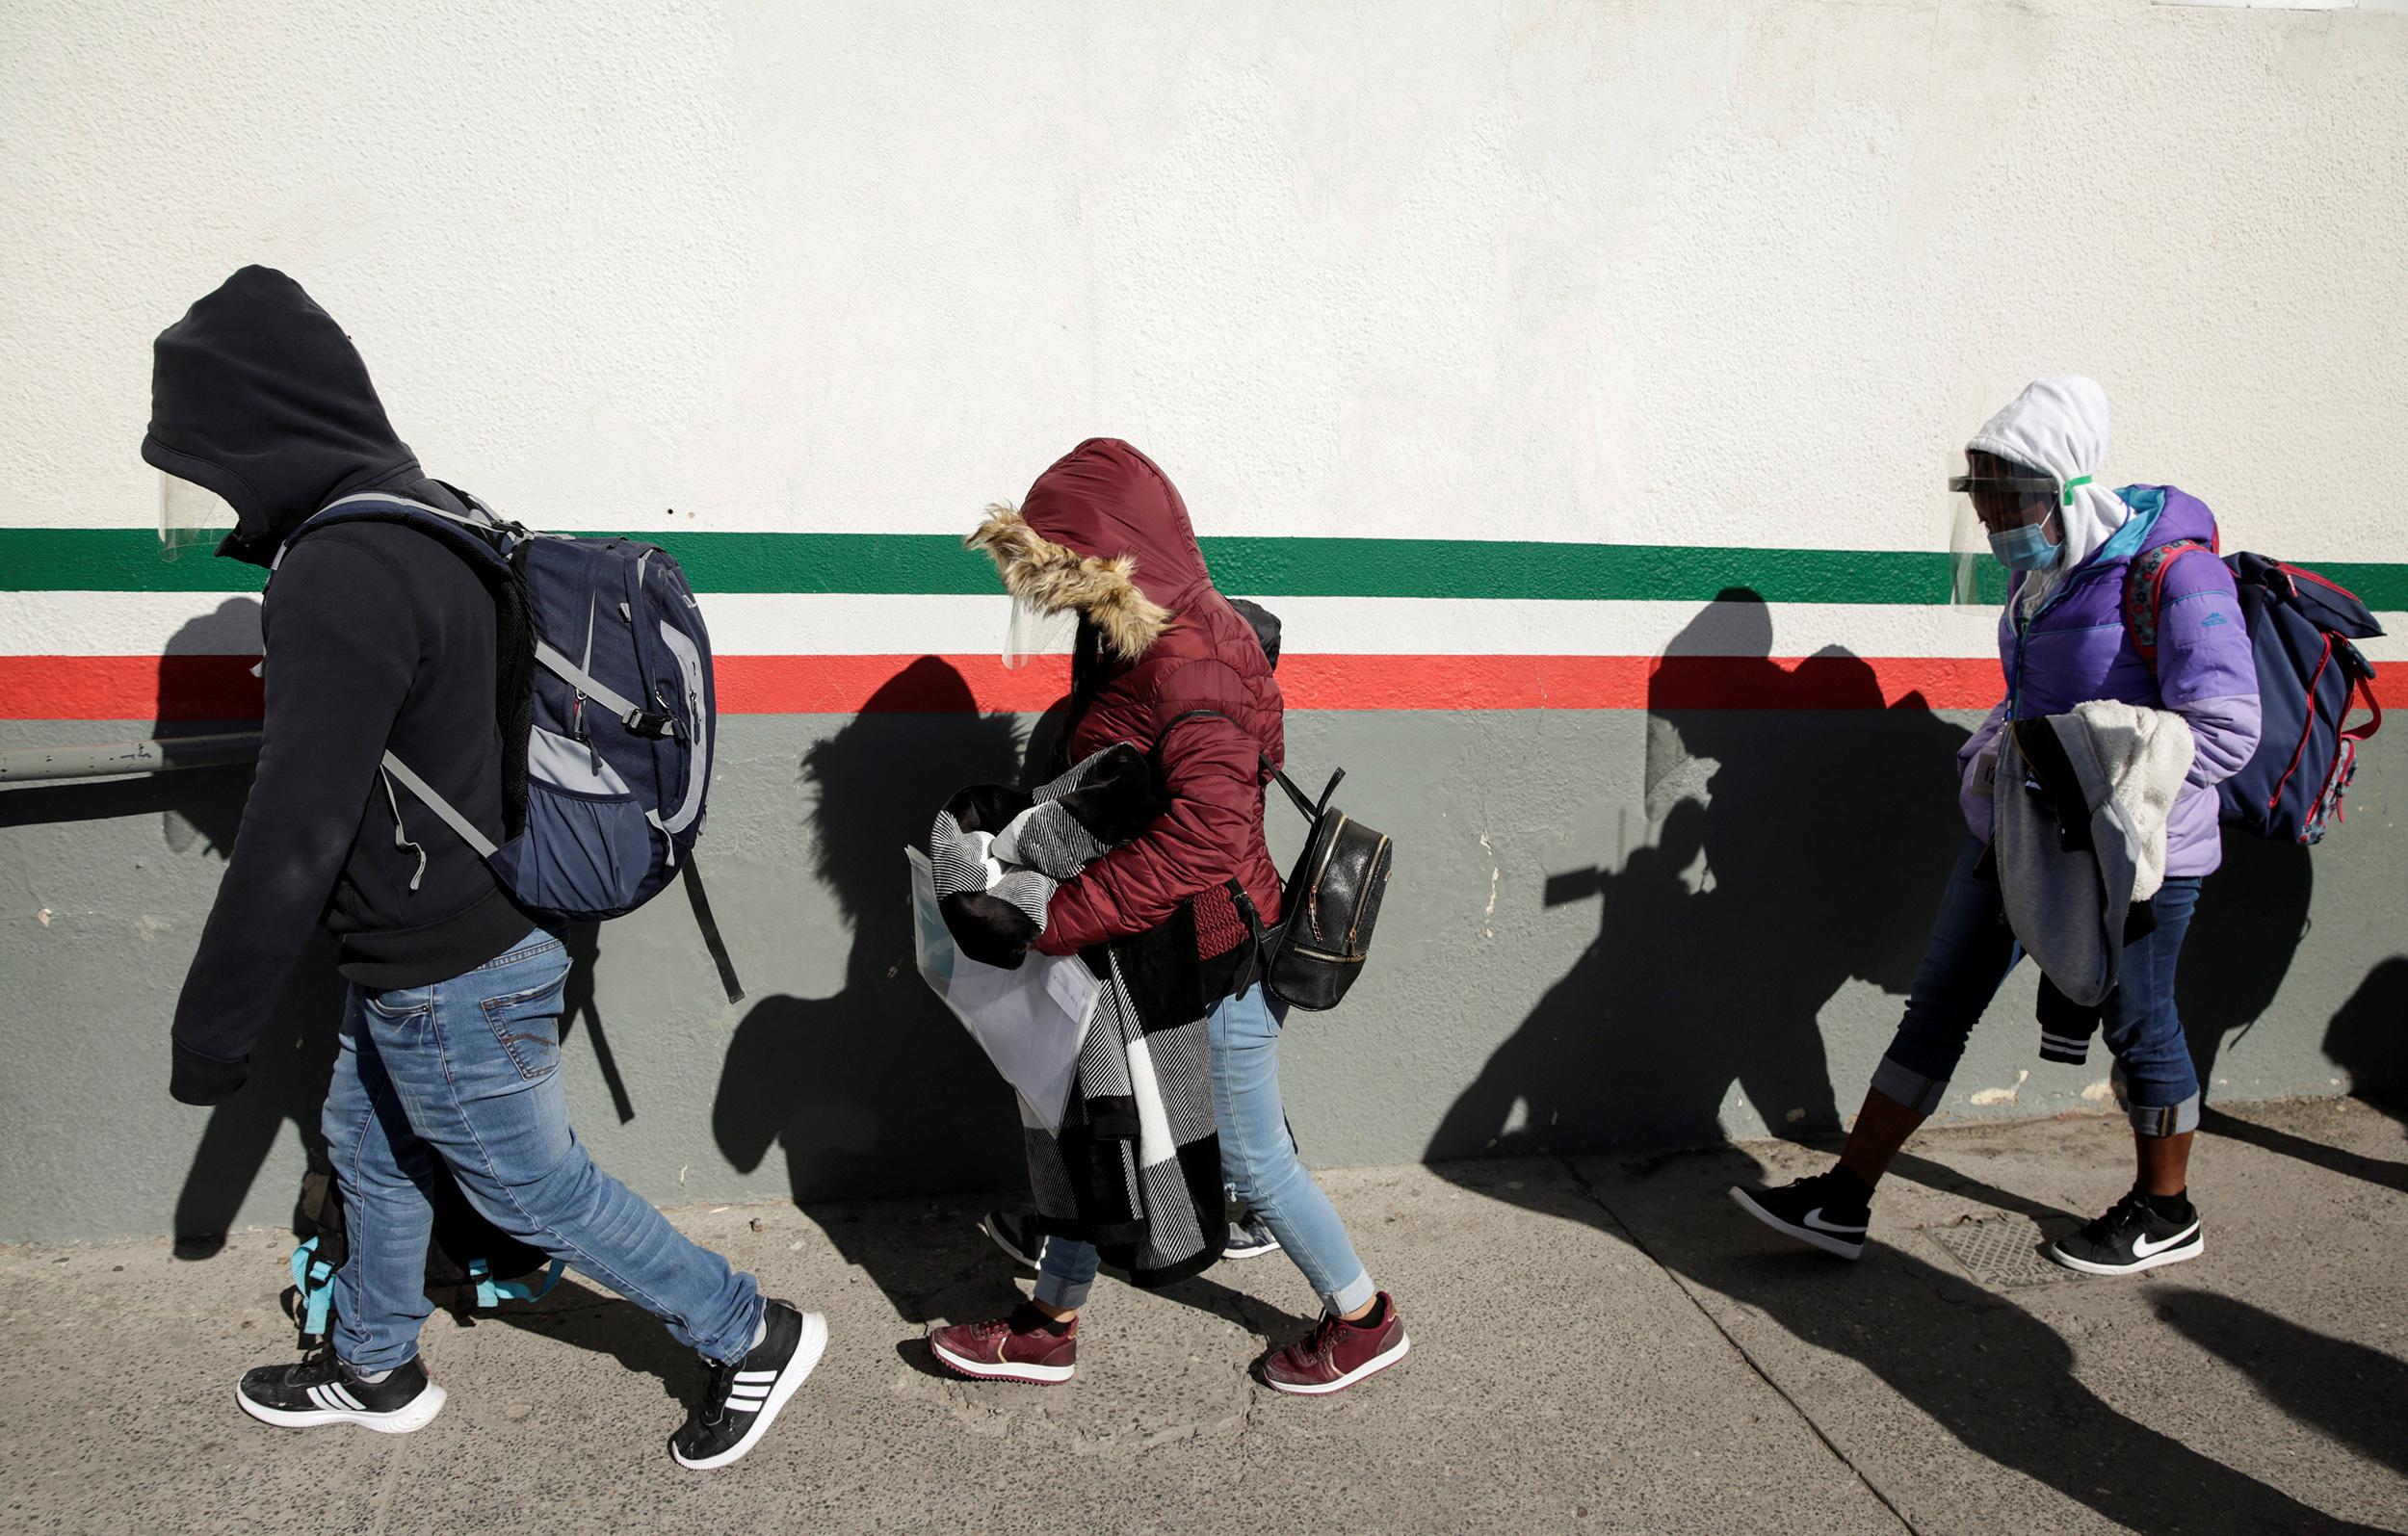 Data-shows-growing-backlog-of-unaccompanied-migrant-children-in-Border-Patrol-custody